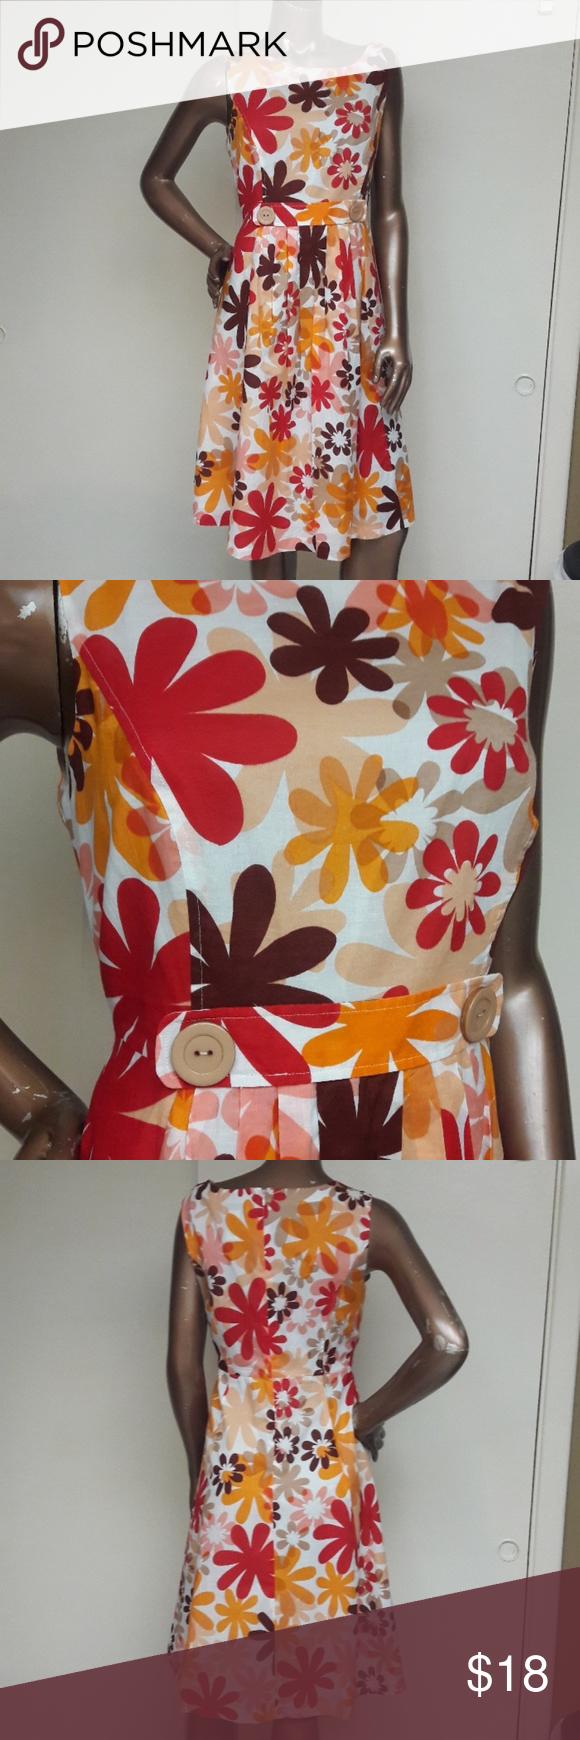 Like New Leap Into Spring Dress By Robbie Bee Brand Robbie